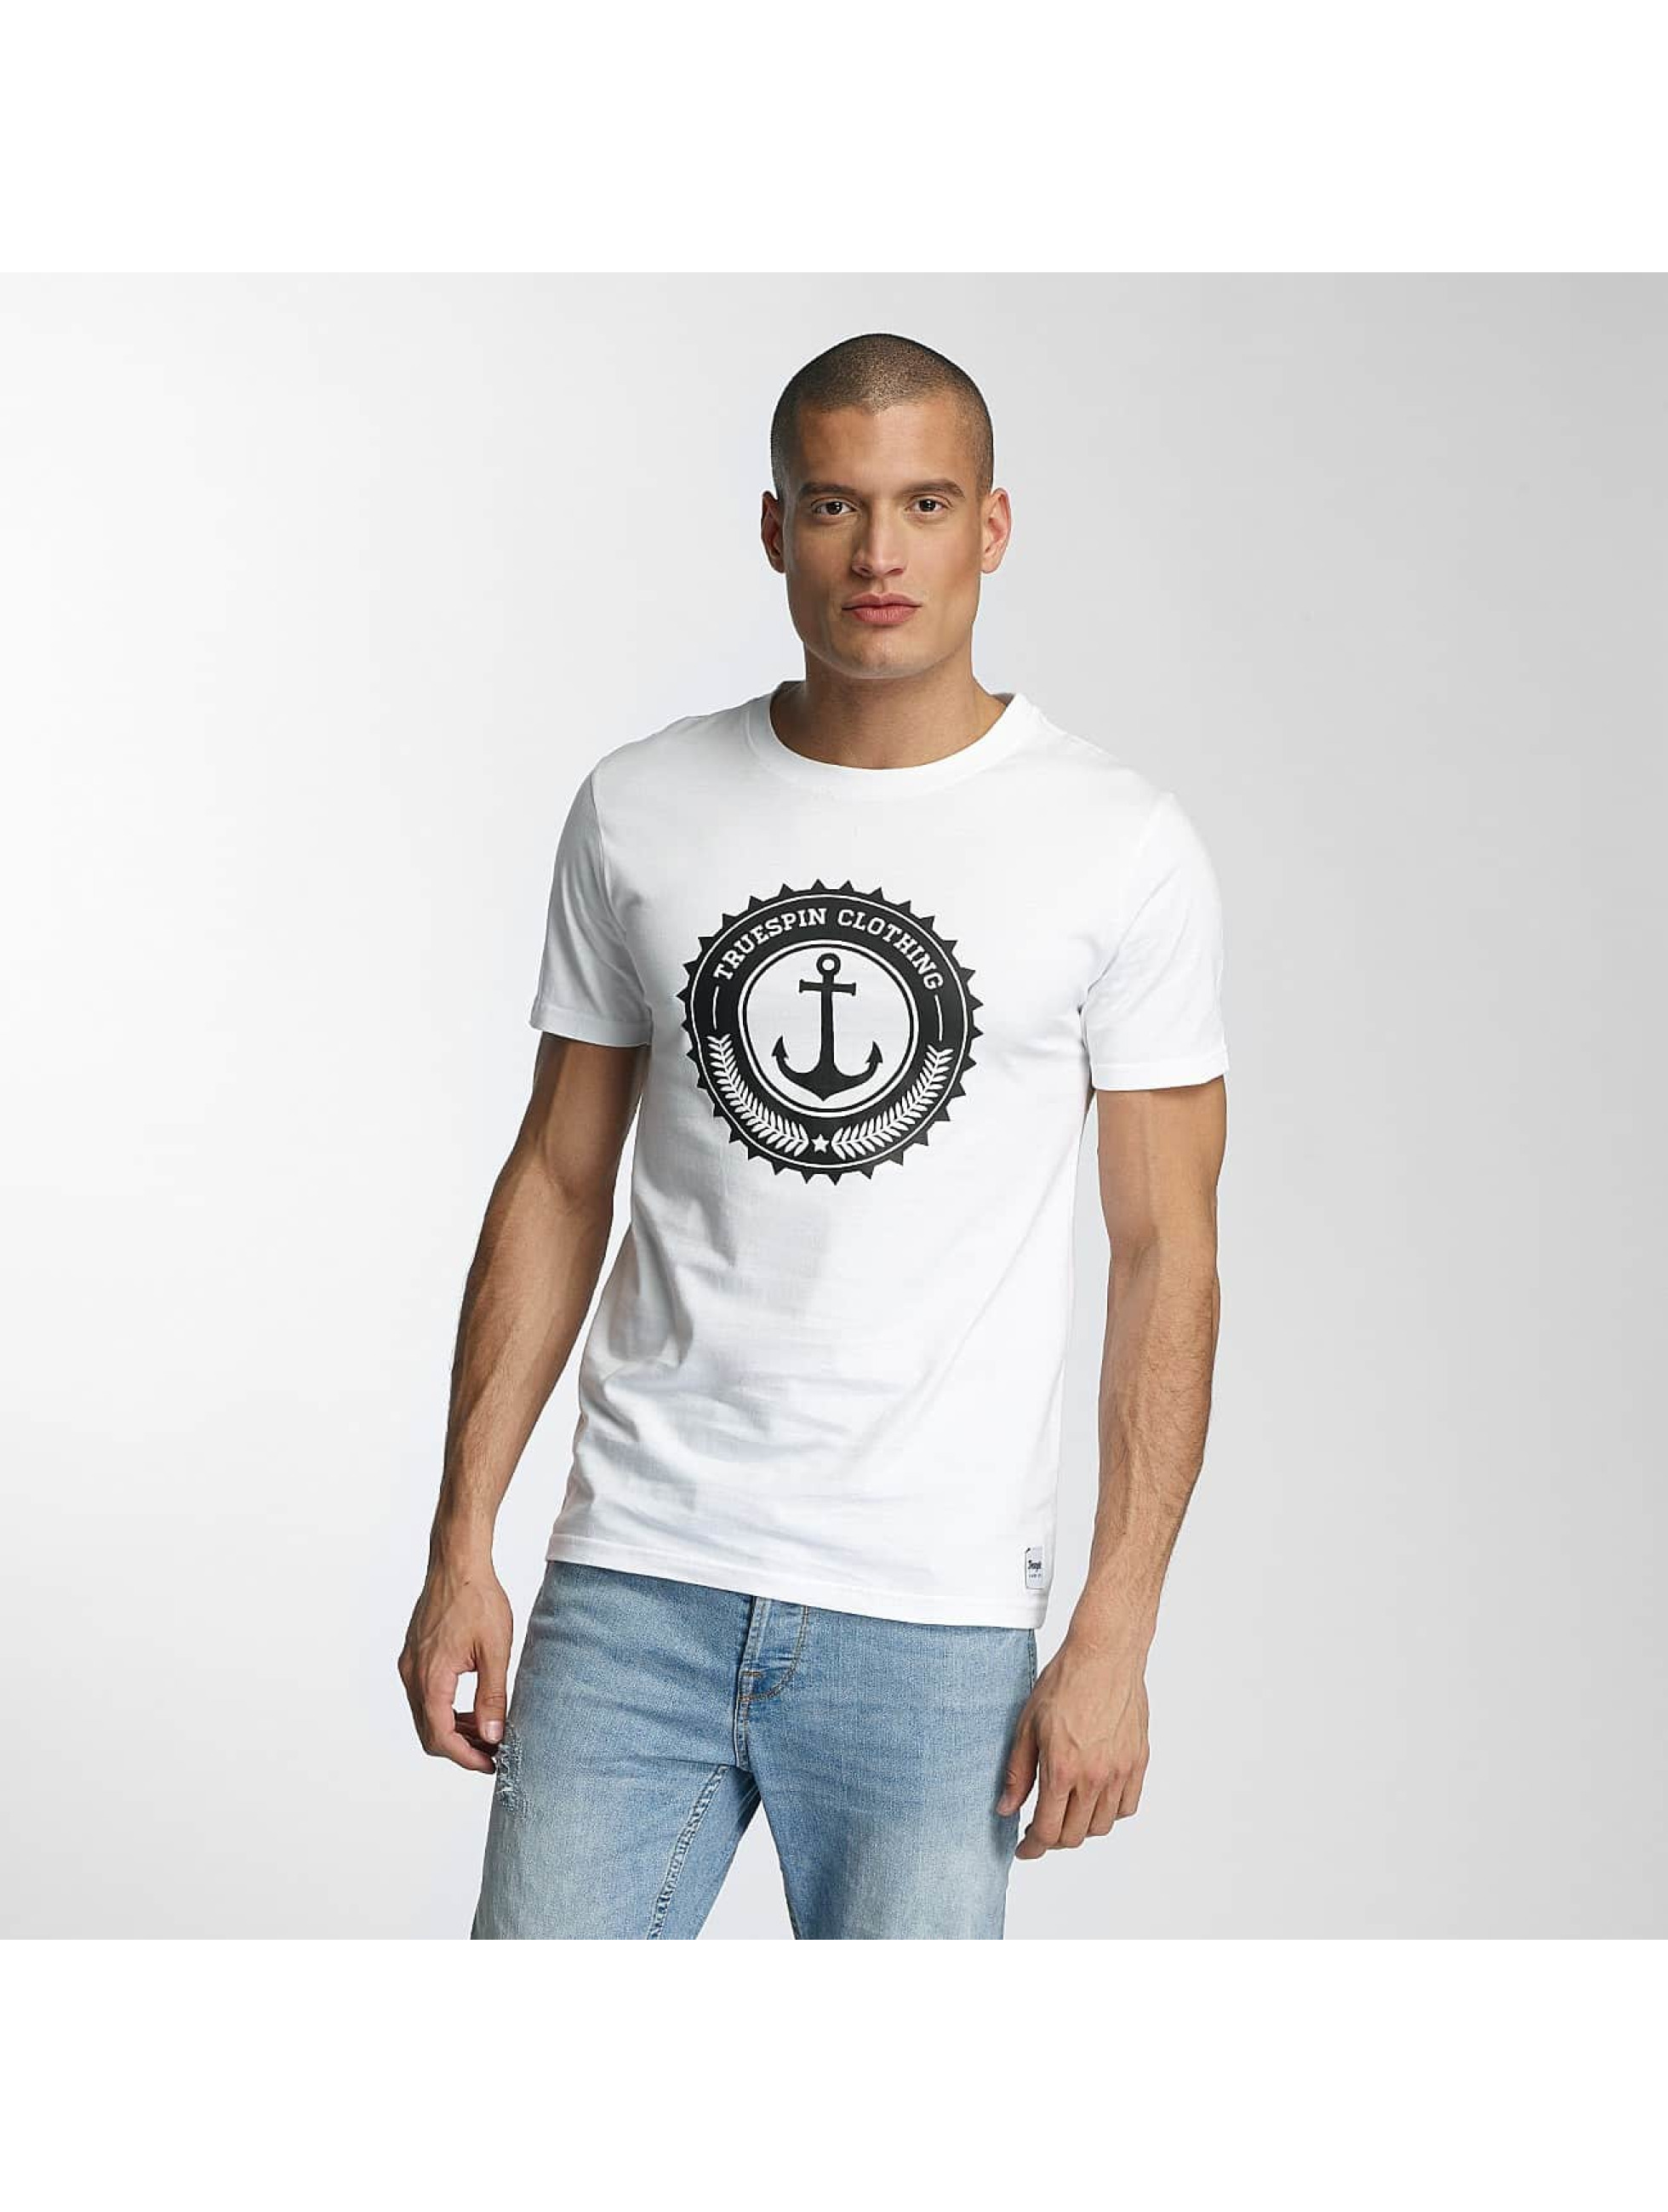 TrueSpin Männer T-Shirt 2 in weiß